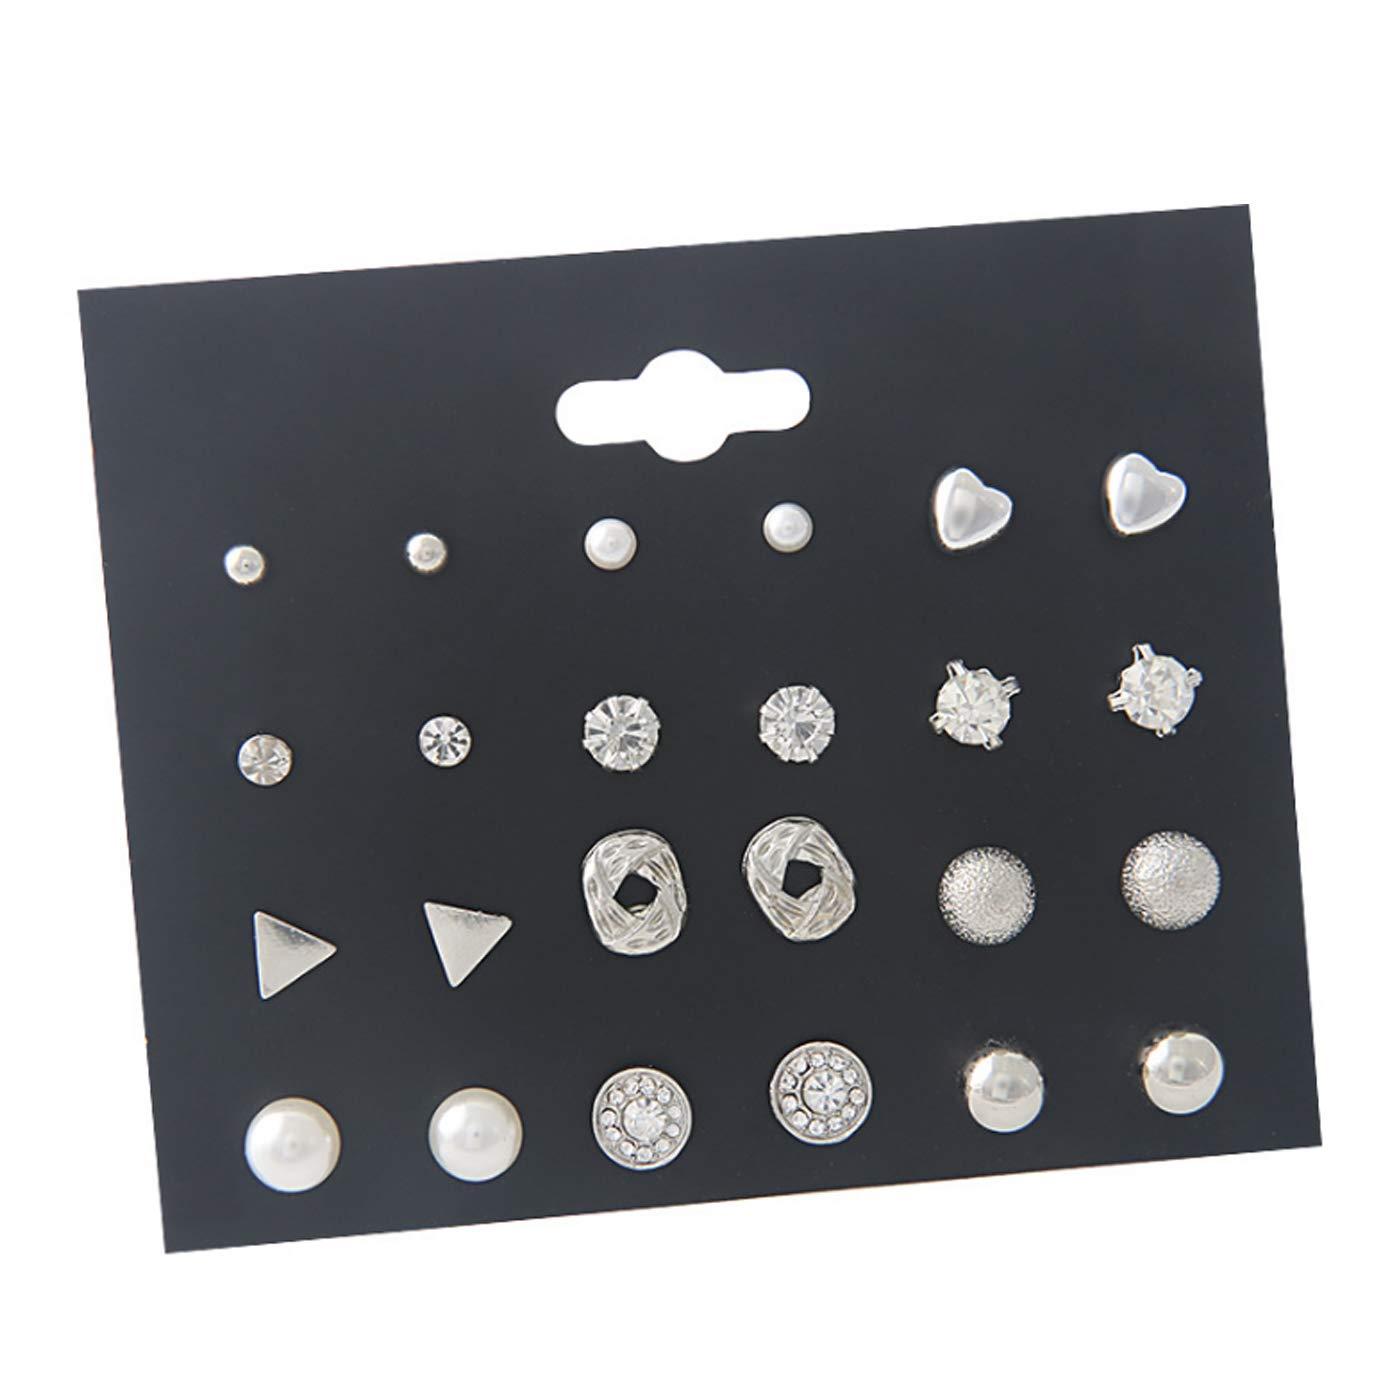 ERAWAN 12Pairs Women Girl Fashion Pearl Crystal Heart Stud Triangle Earring Set Jewelry EW sakcharn (Gold) Earrings